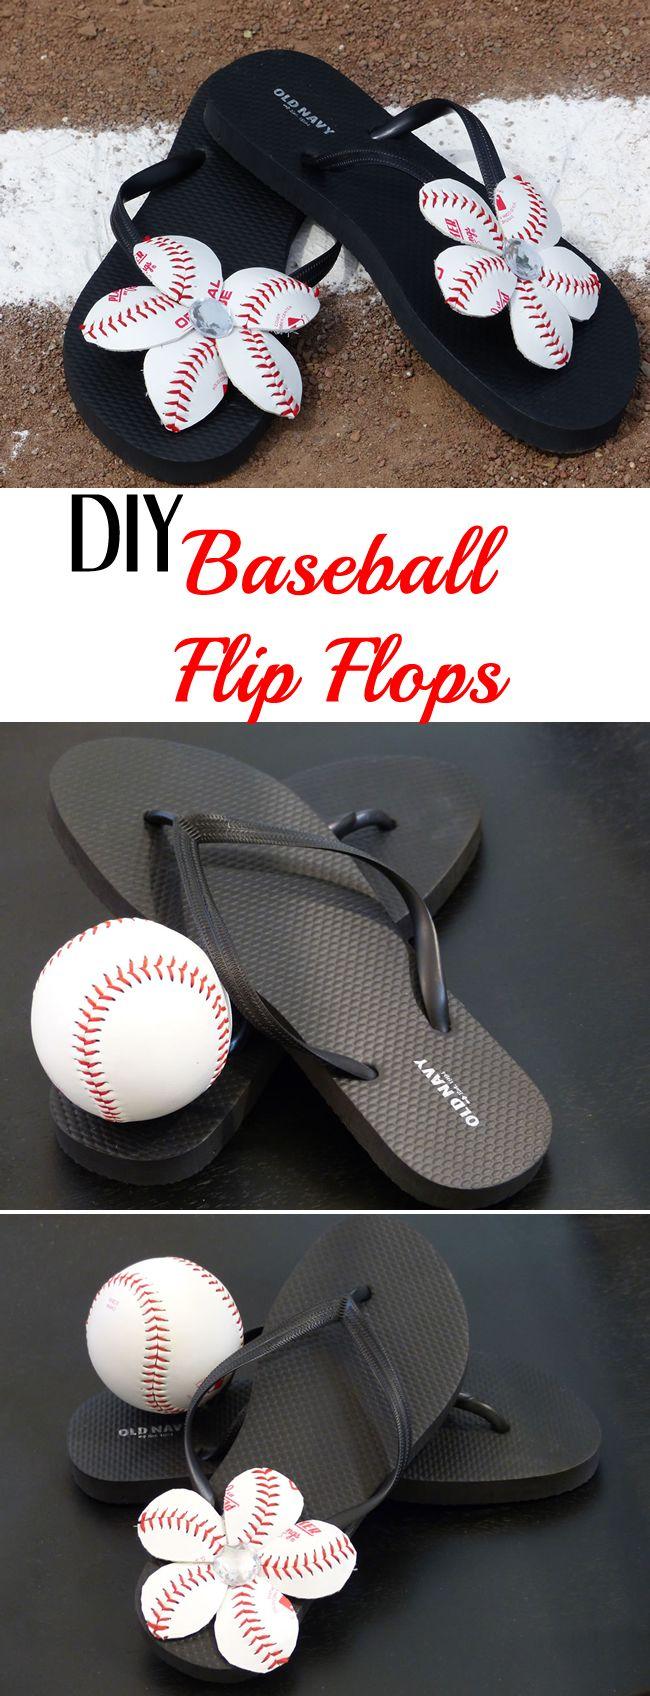 DIY Baseball Flower Flip Flops {Video Tutorial}Make your own DIY Baseball Flips Flops! Fun, easy and perfect for baseball season!